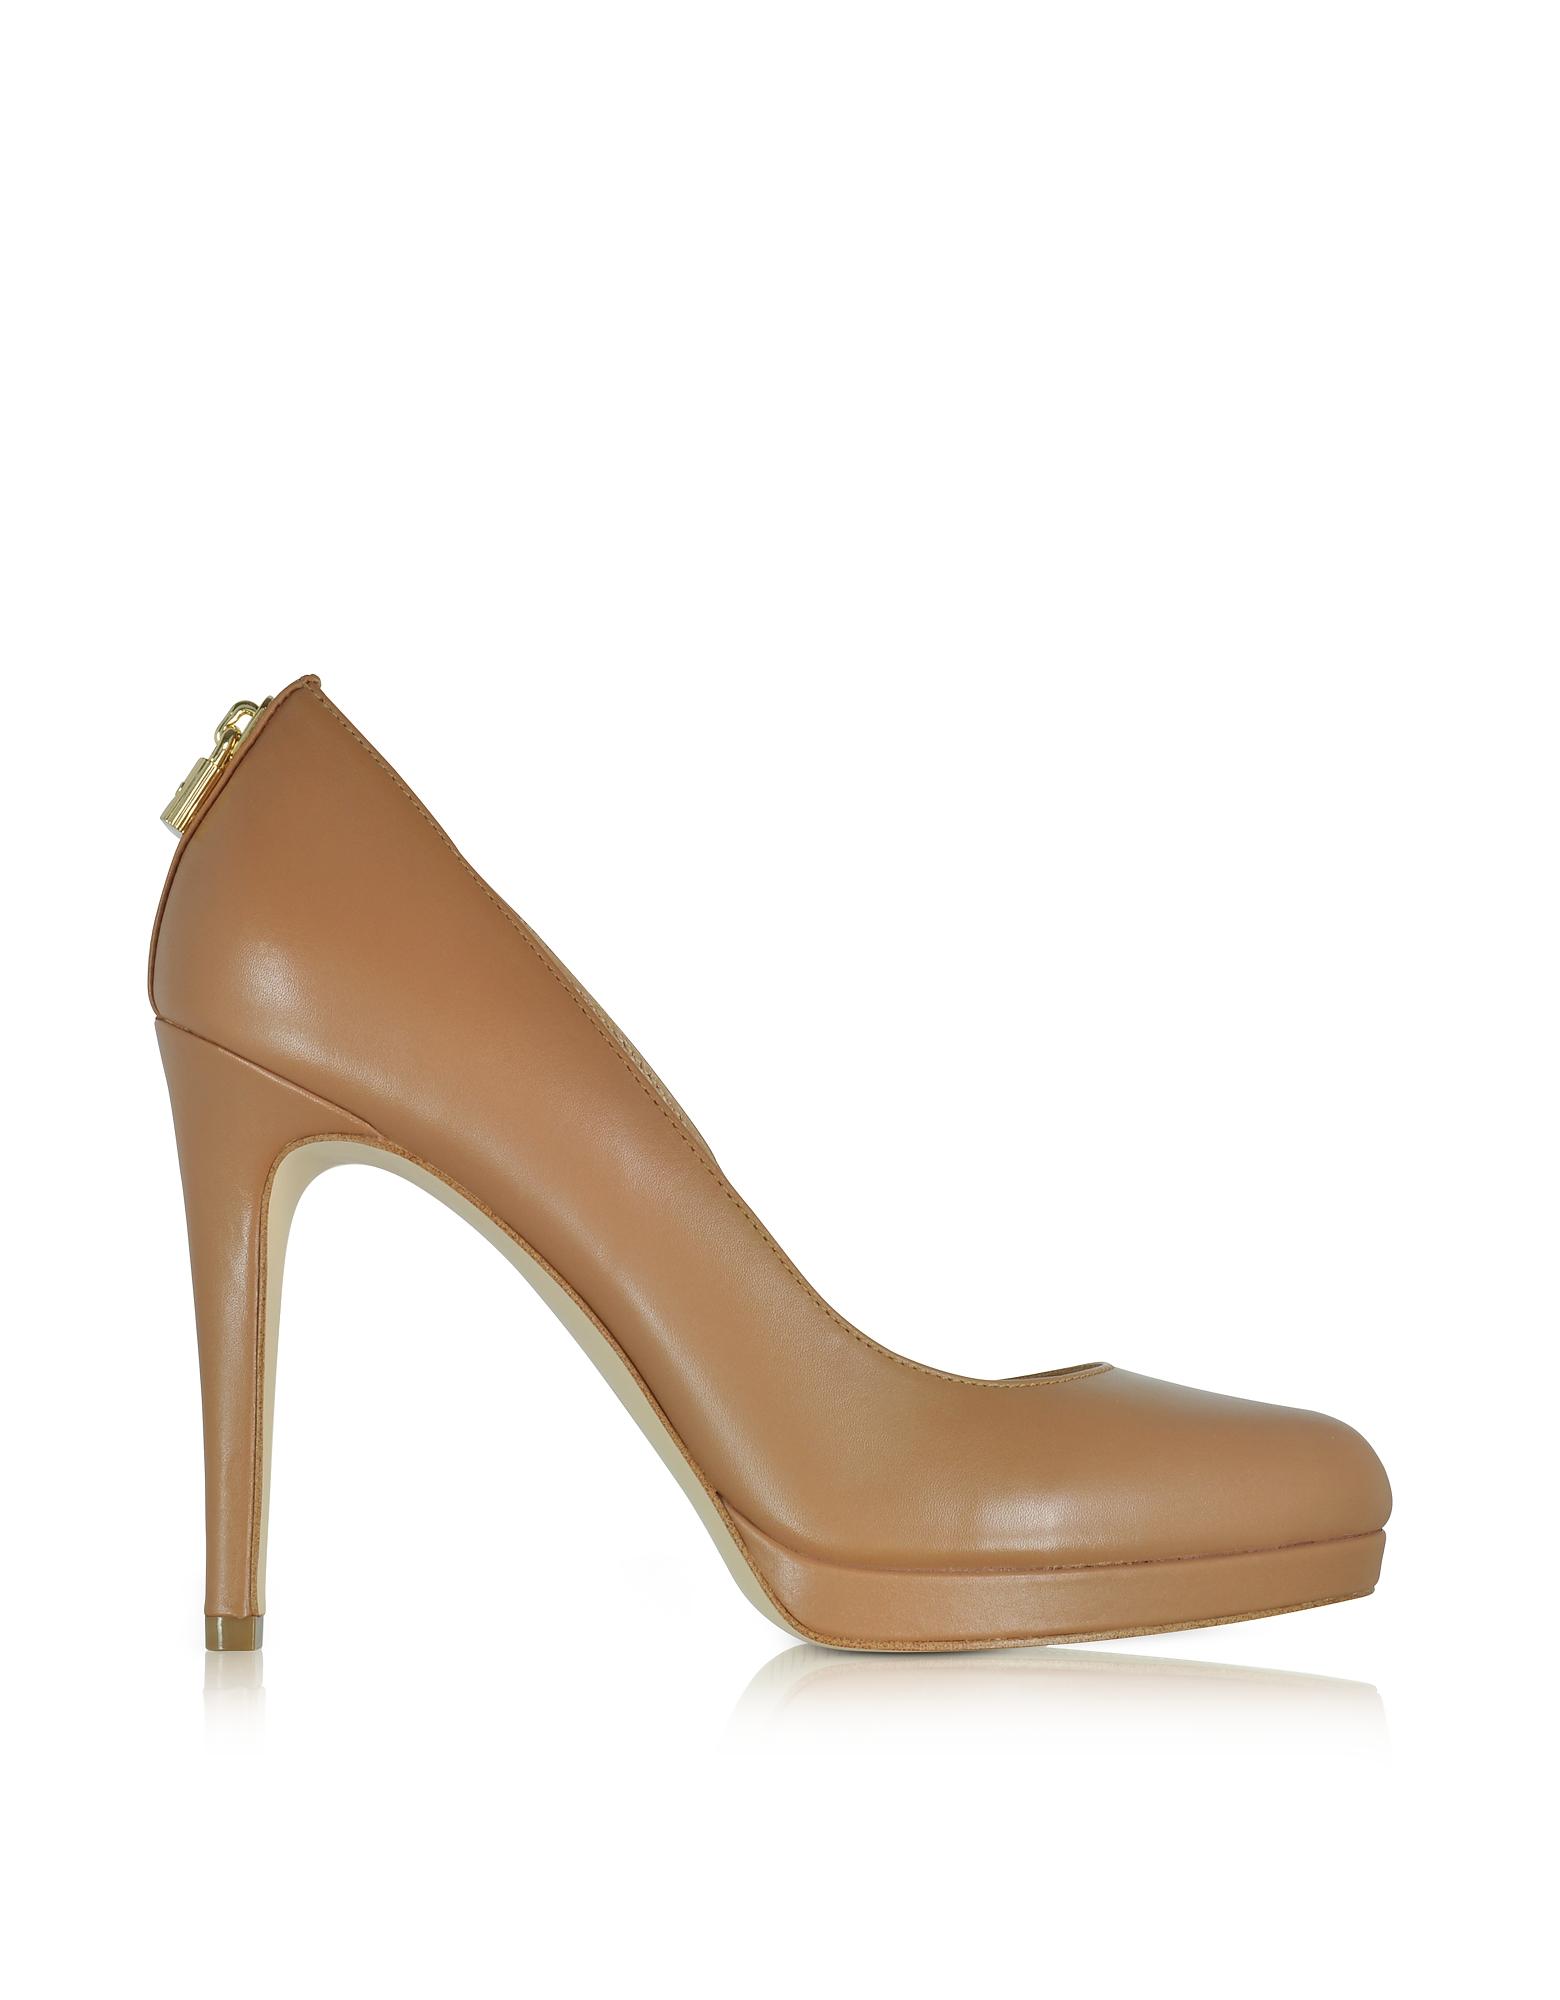 Michael Kors Antoinette Acorn Leather Heel Pumps